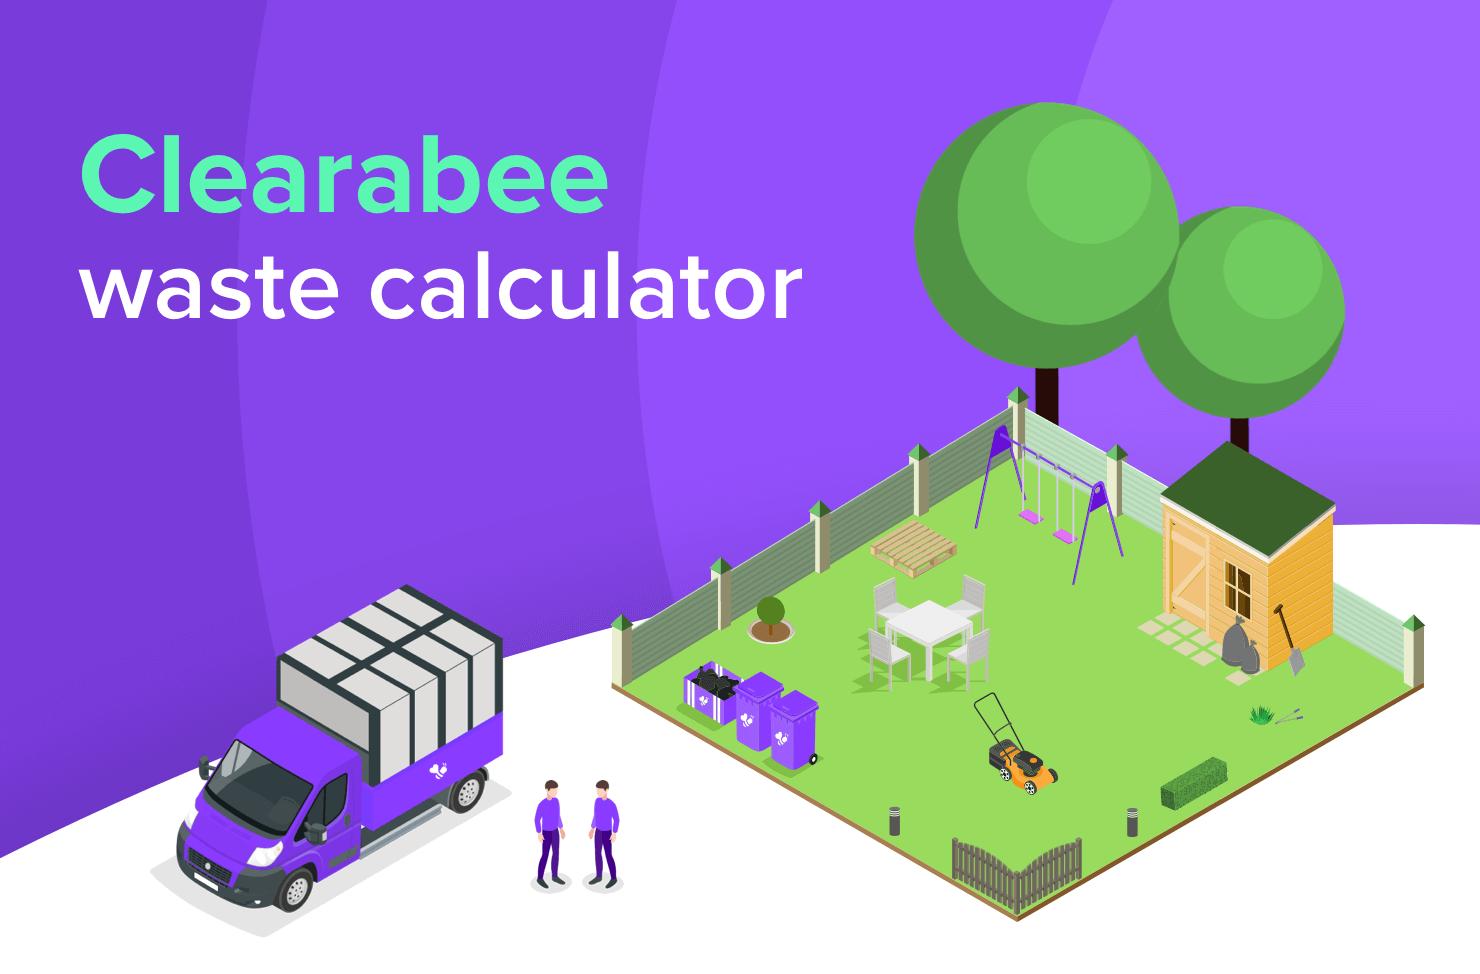 Clearabee waste calculator